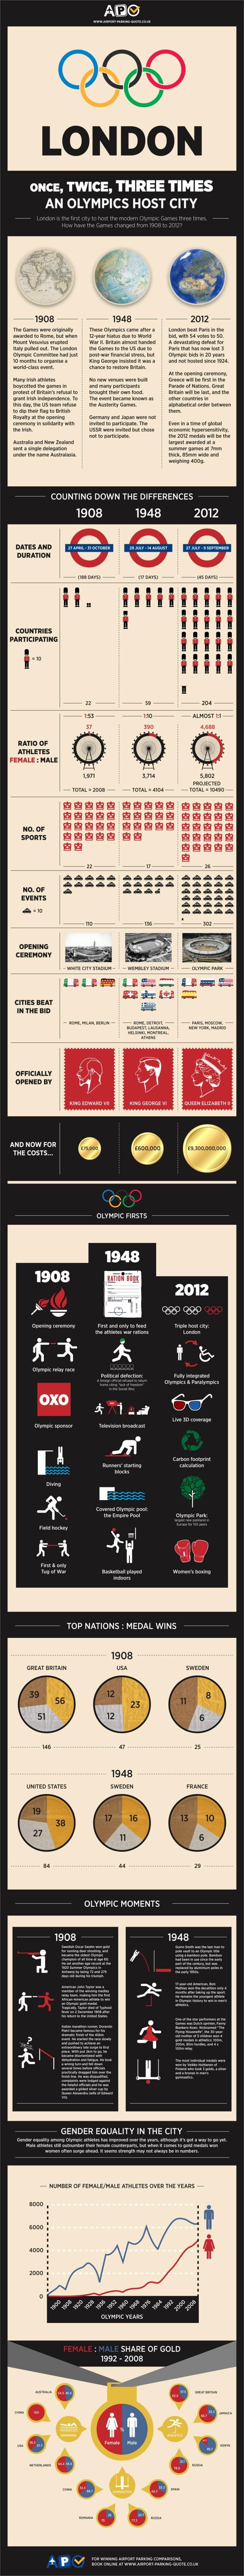 LondonThreeTimesAnOlympicCity 4f5a2a70a2f22 Datos interesantes de los terceros Juegos Olímpicos celebrados en Londres [Infografía]